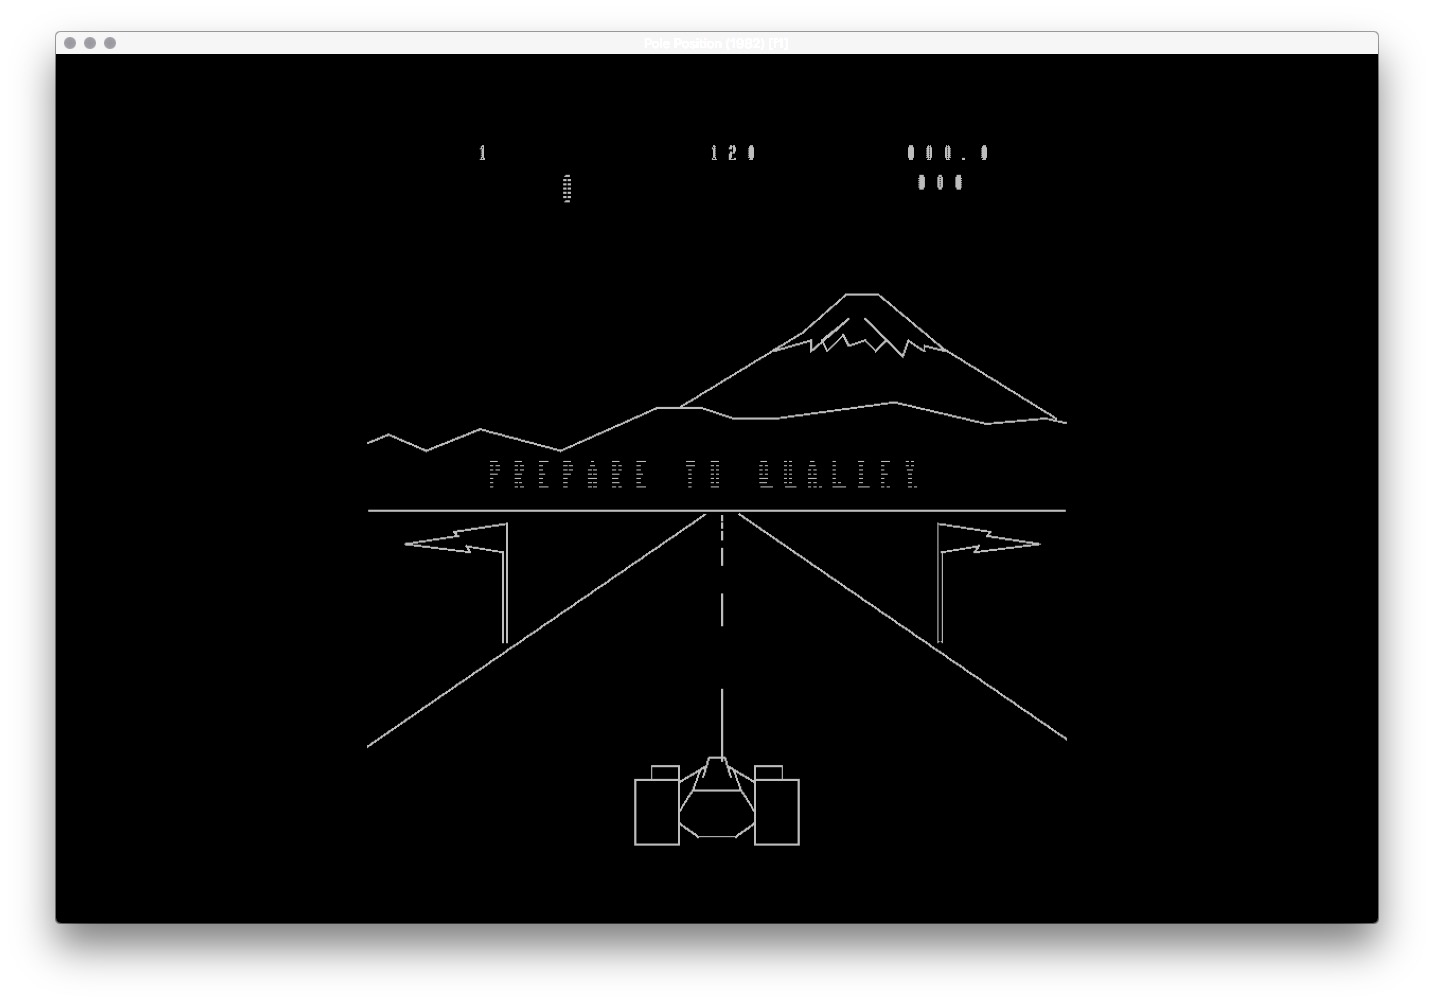 OpenEmu adds Atari Lynx, Nintendo 64, Sony Playstation / PSP